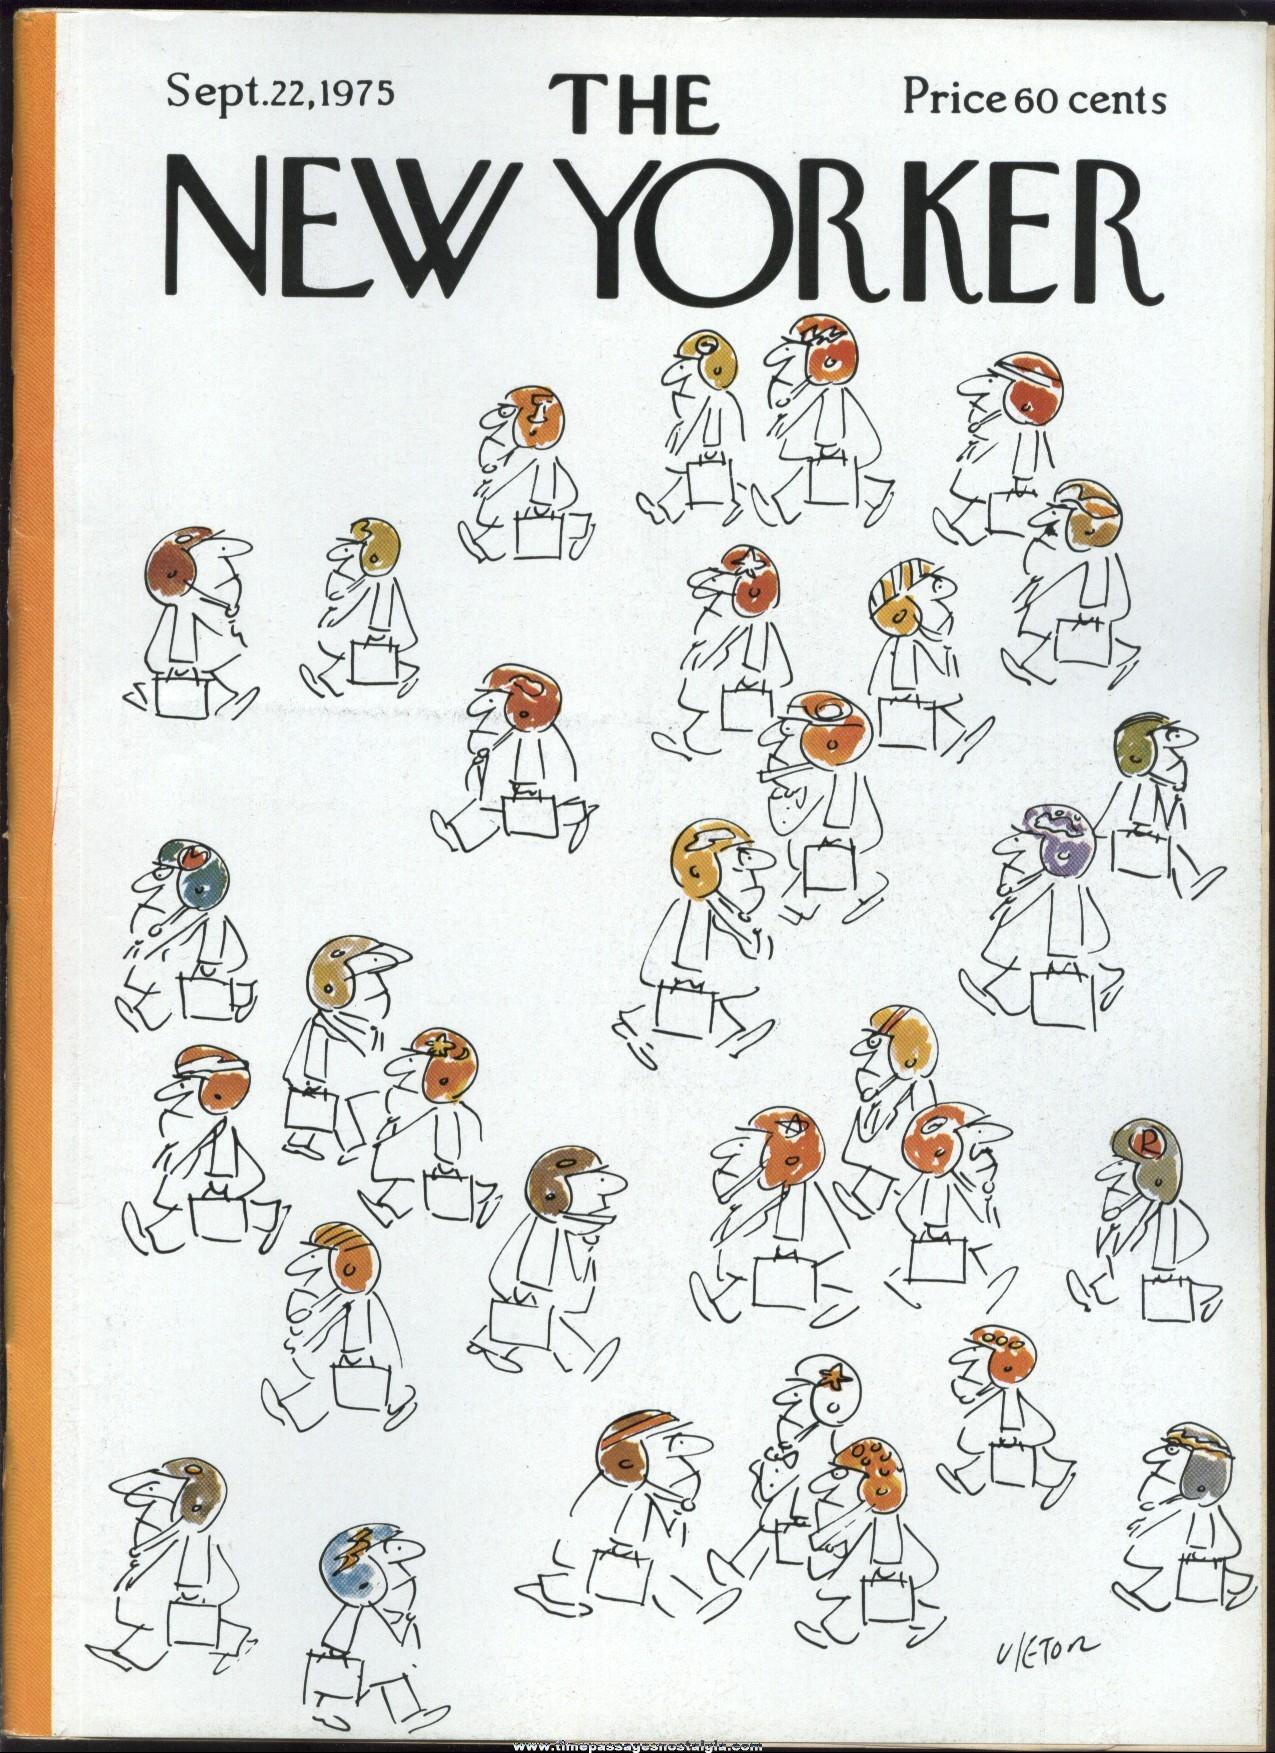 New Yorker Magazine - September 22, 1975 - Cover by Dean Vietor